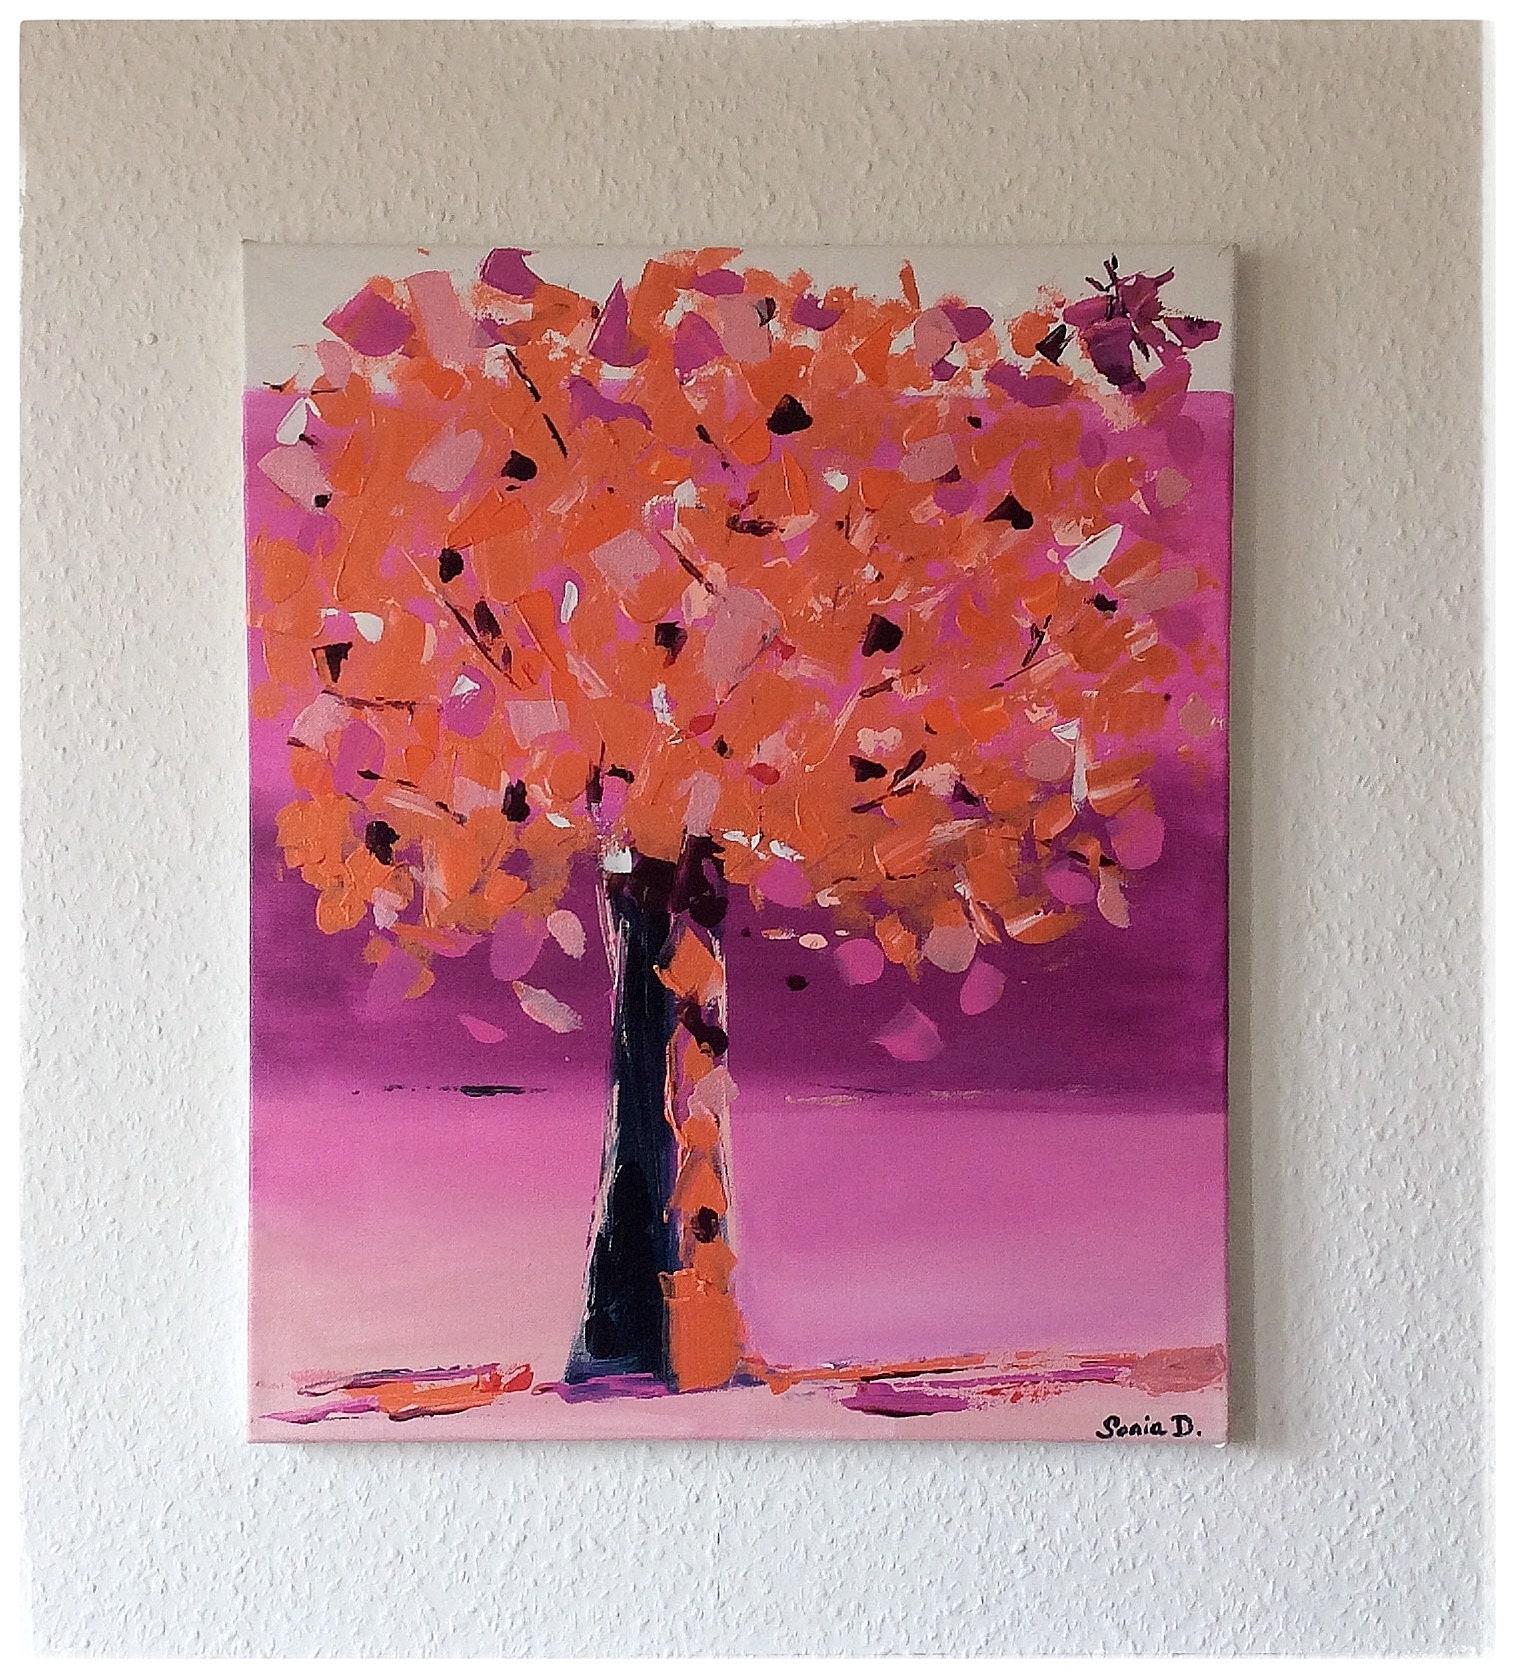 tableau moderne arbre color tableau abstrait arbre. Black Bedroom Furniture Sets. Home Design Ideas